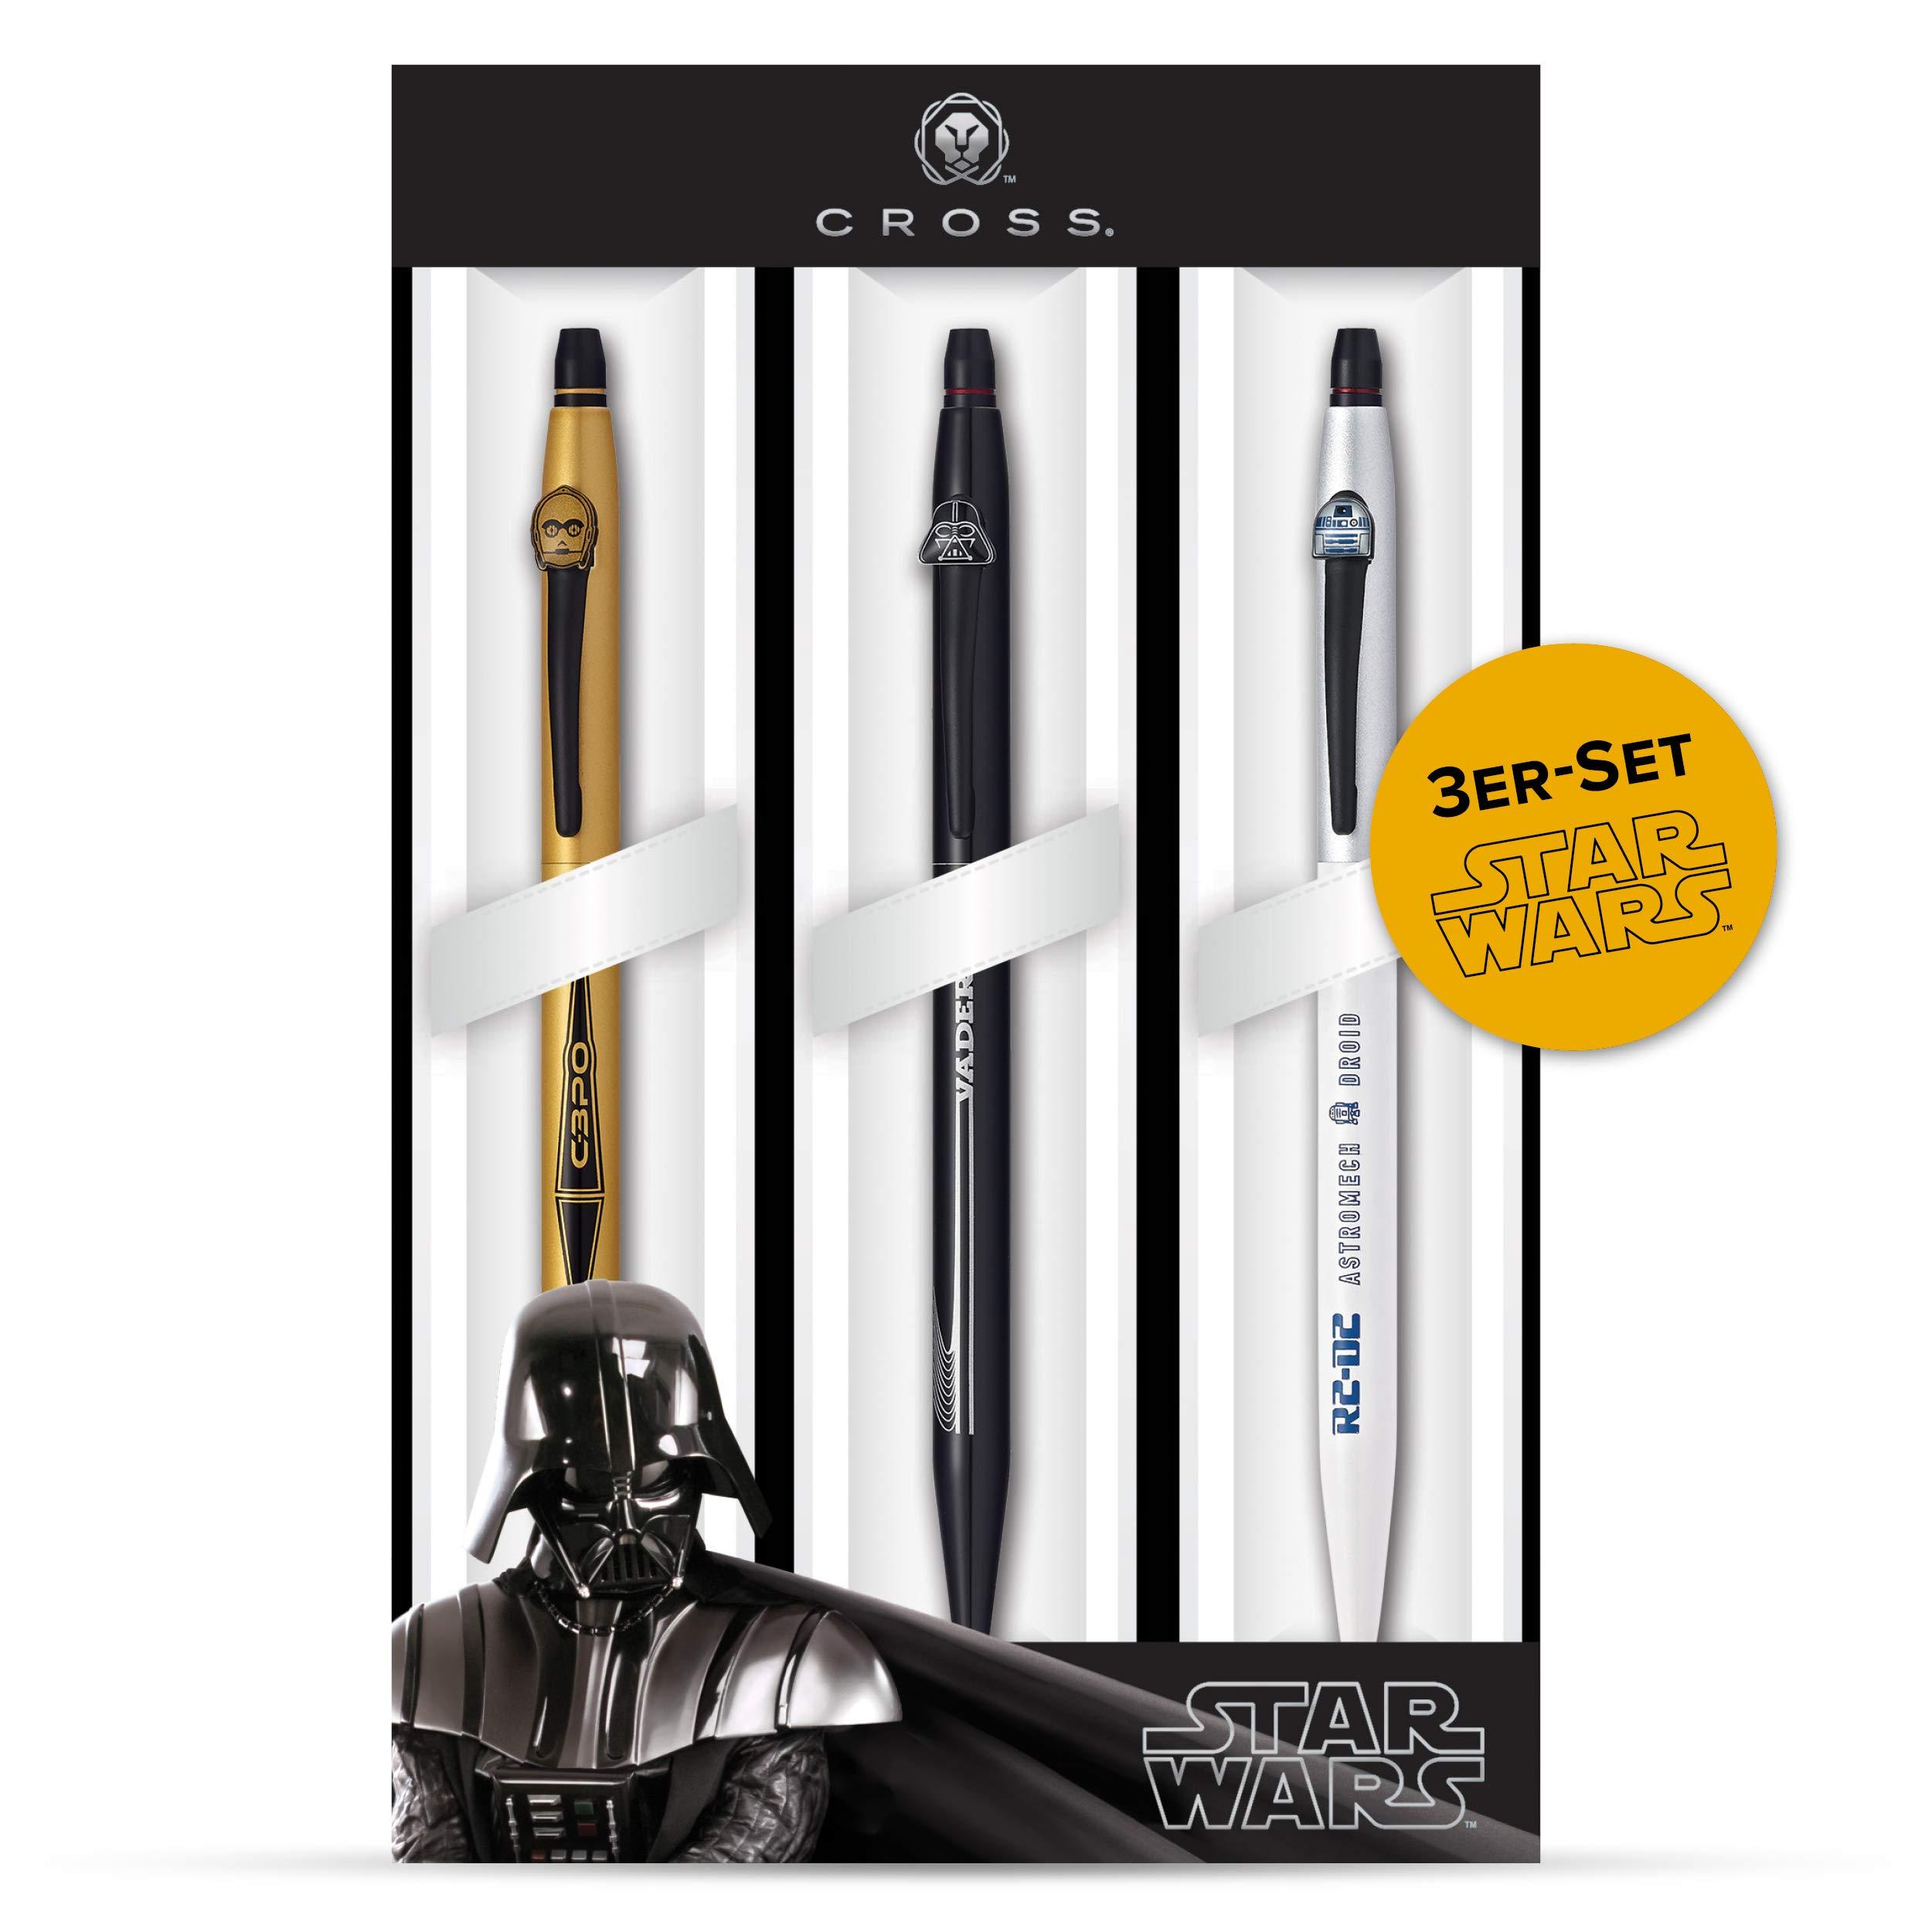 Cross Click Star Wars 3-Pack Gel Ink Pens - Darth Vader, C-3PO, R2-D2 (9857M3) by Cross